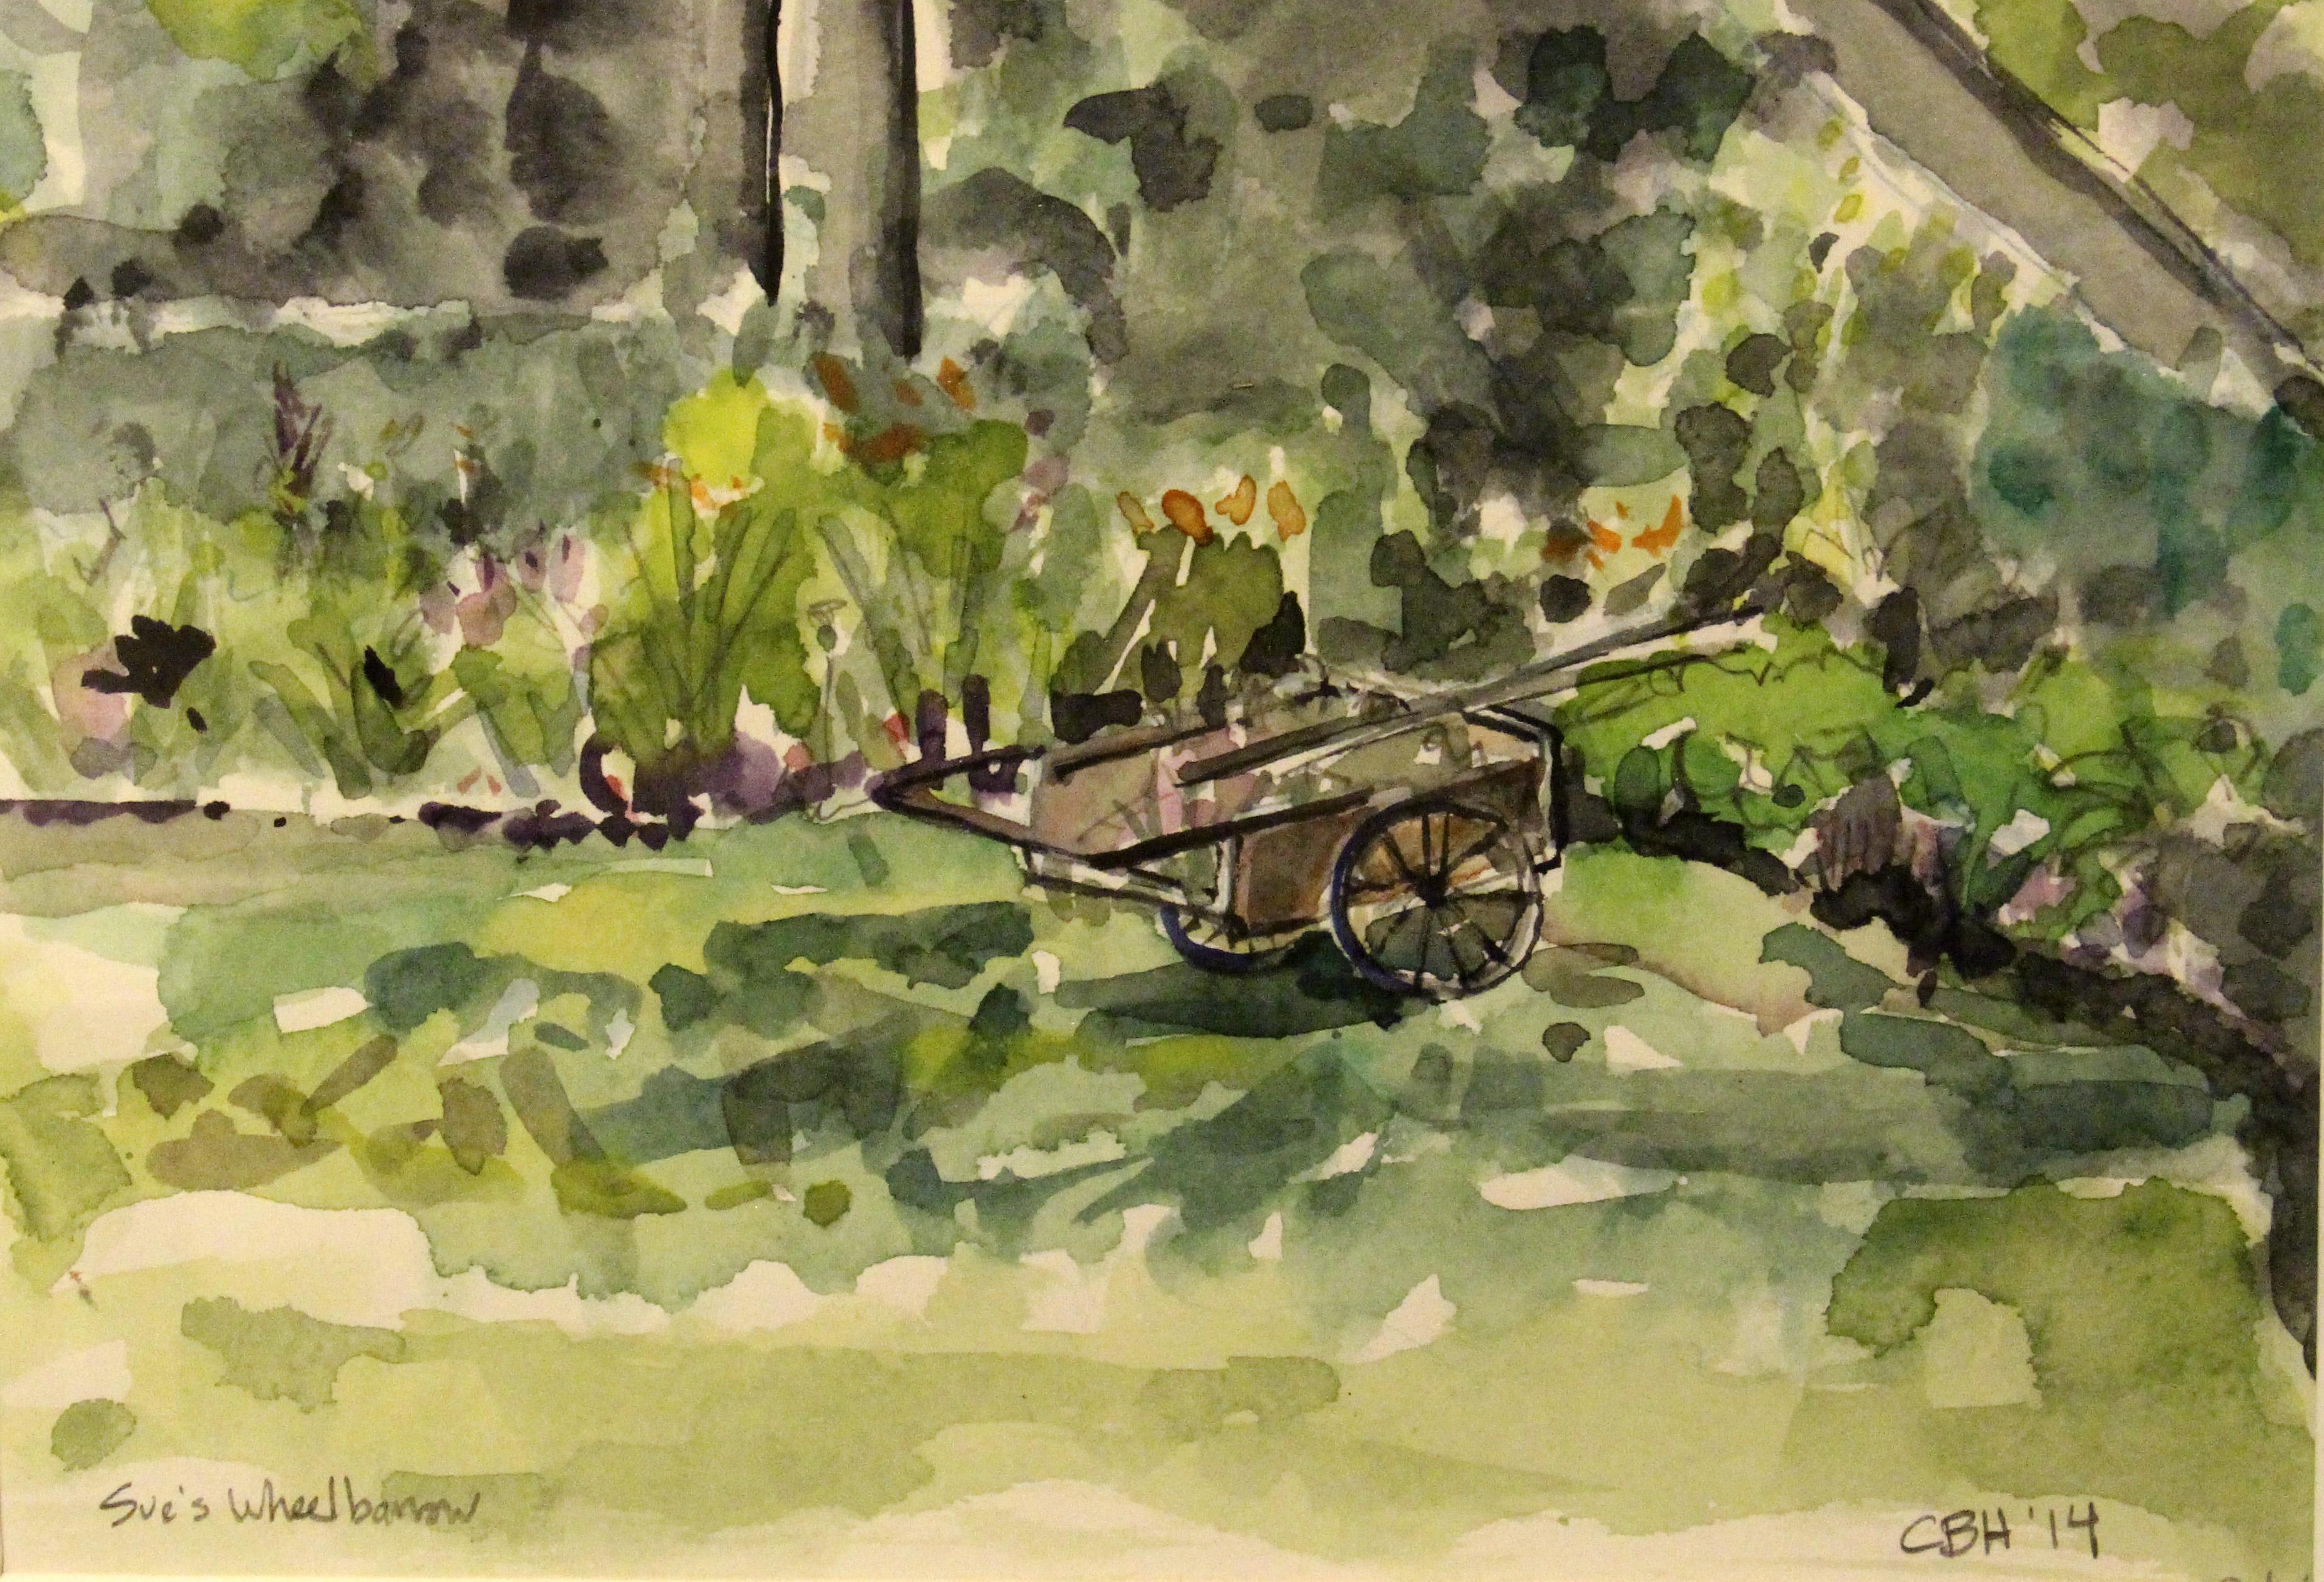 Sue's Wheelbarrow